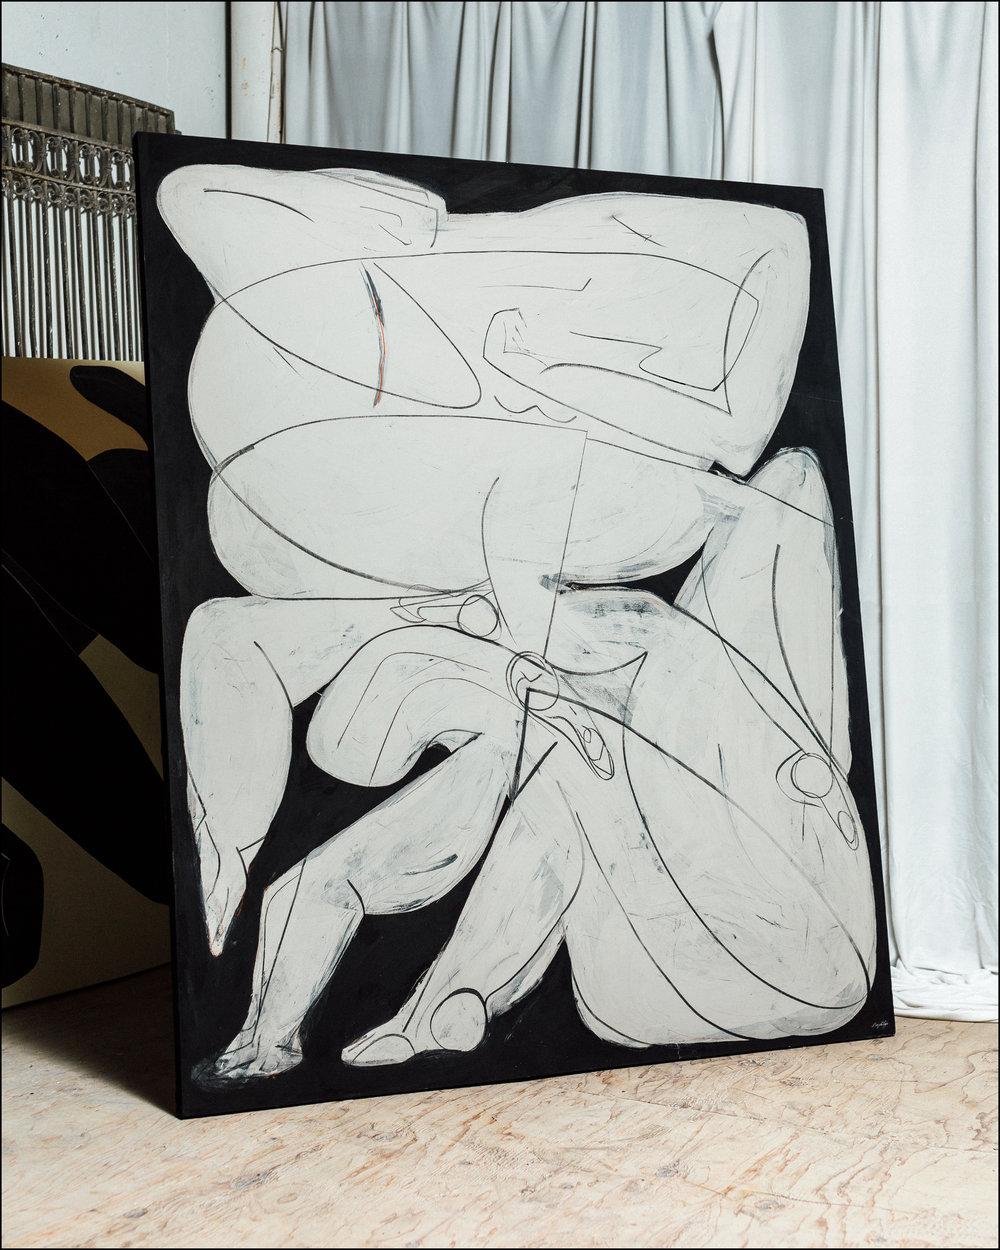 Censure  - 2018 -Tempura, Charcoal & Oil Pastel on Canvas -60 x 72 Inches (152.4 x 182.8cm)